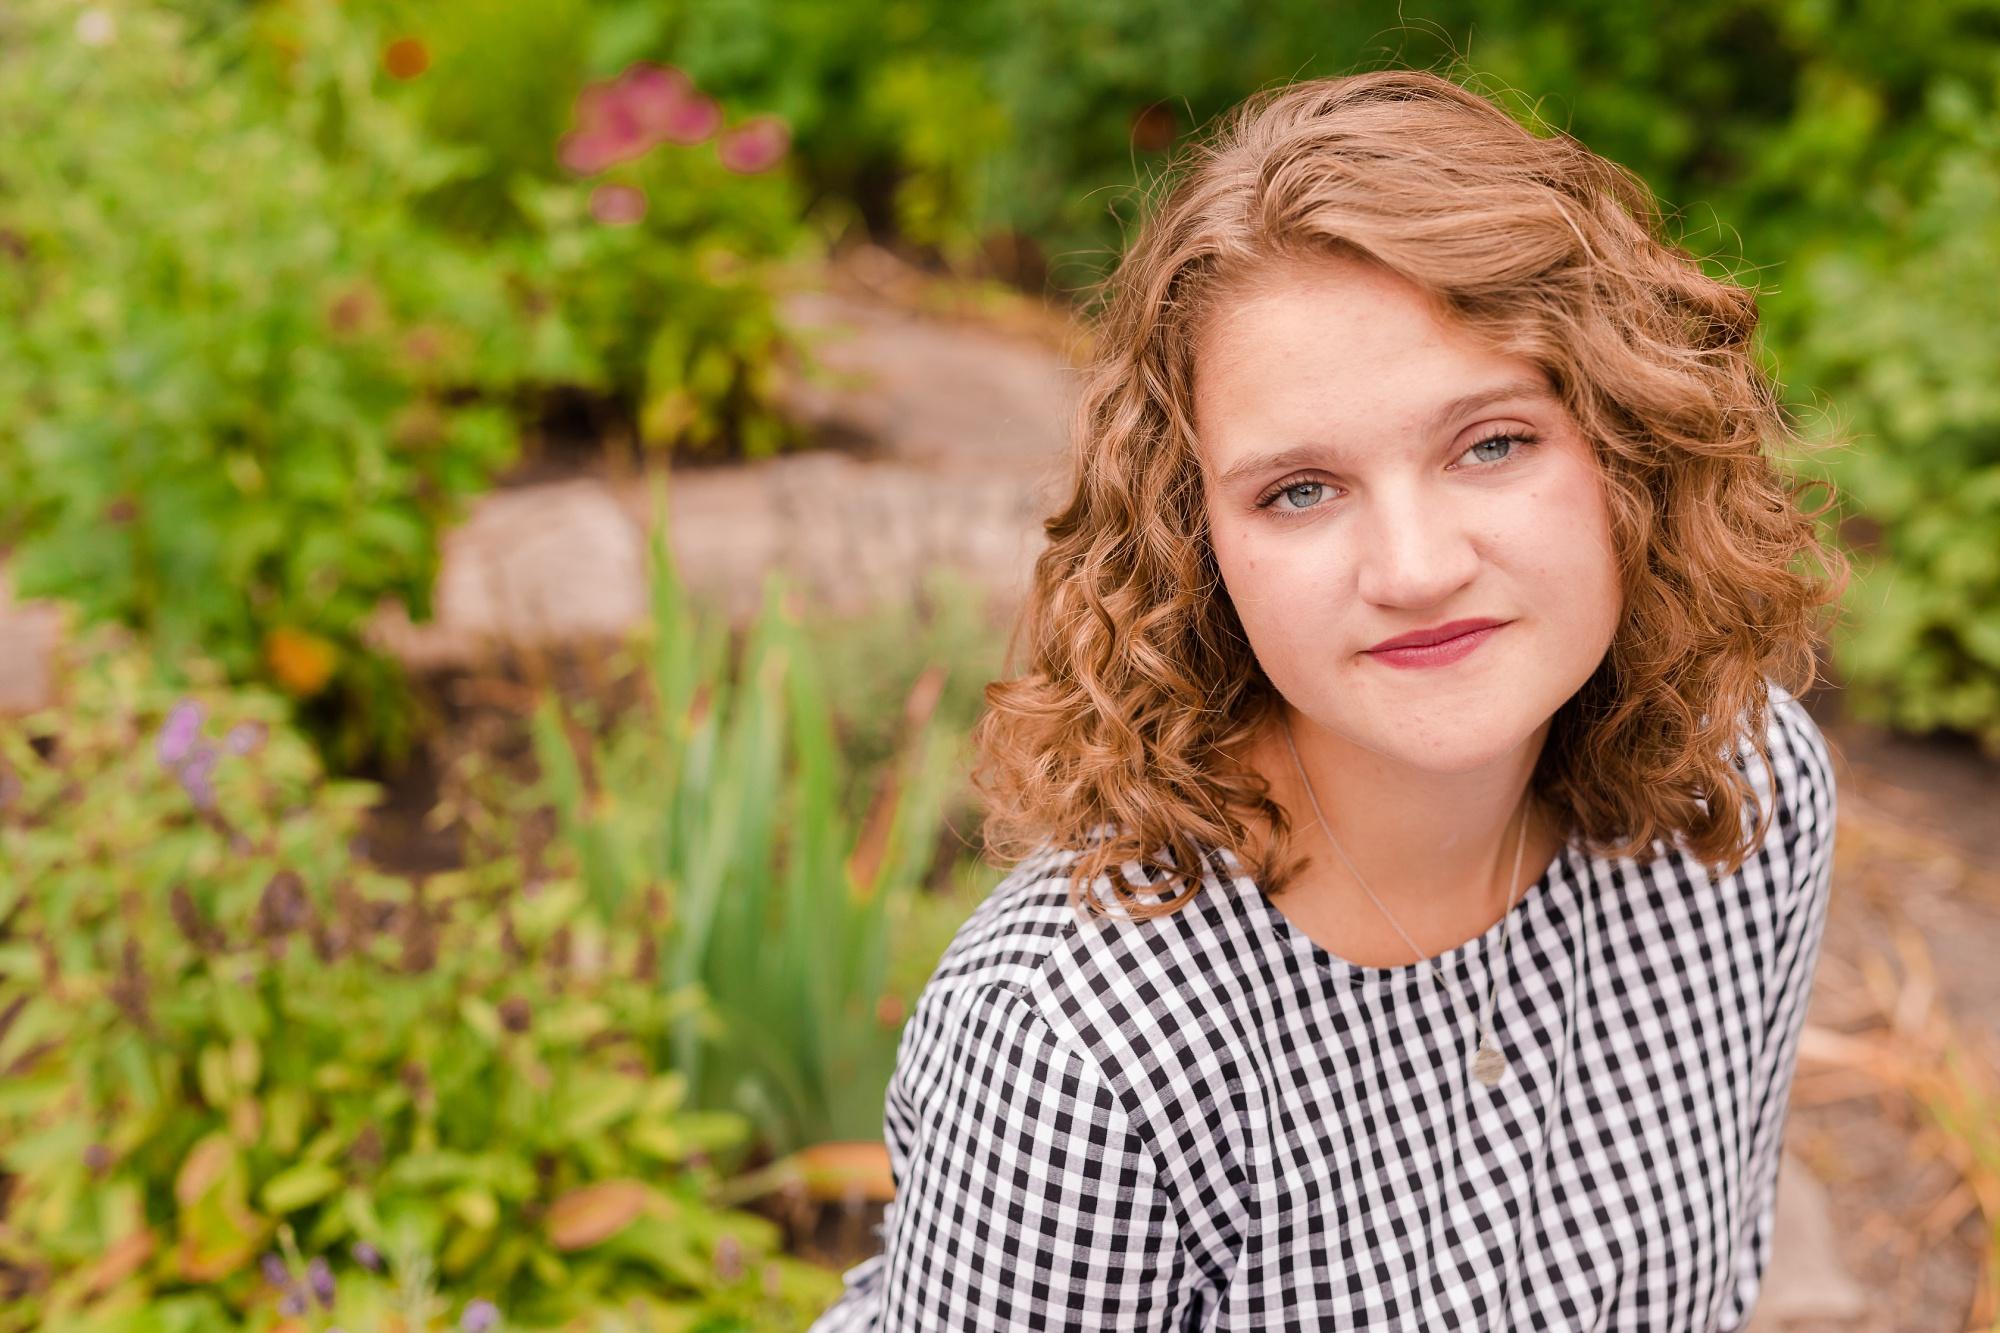 AmberLangerudPhotography_Lakeside Senior Pictures_2789.jpg